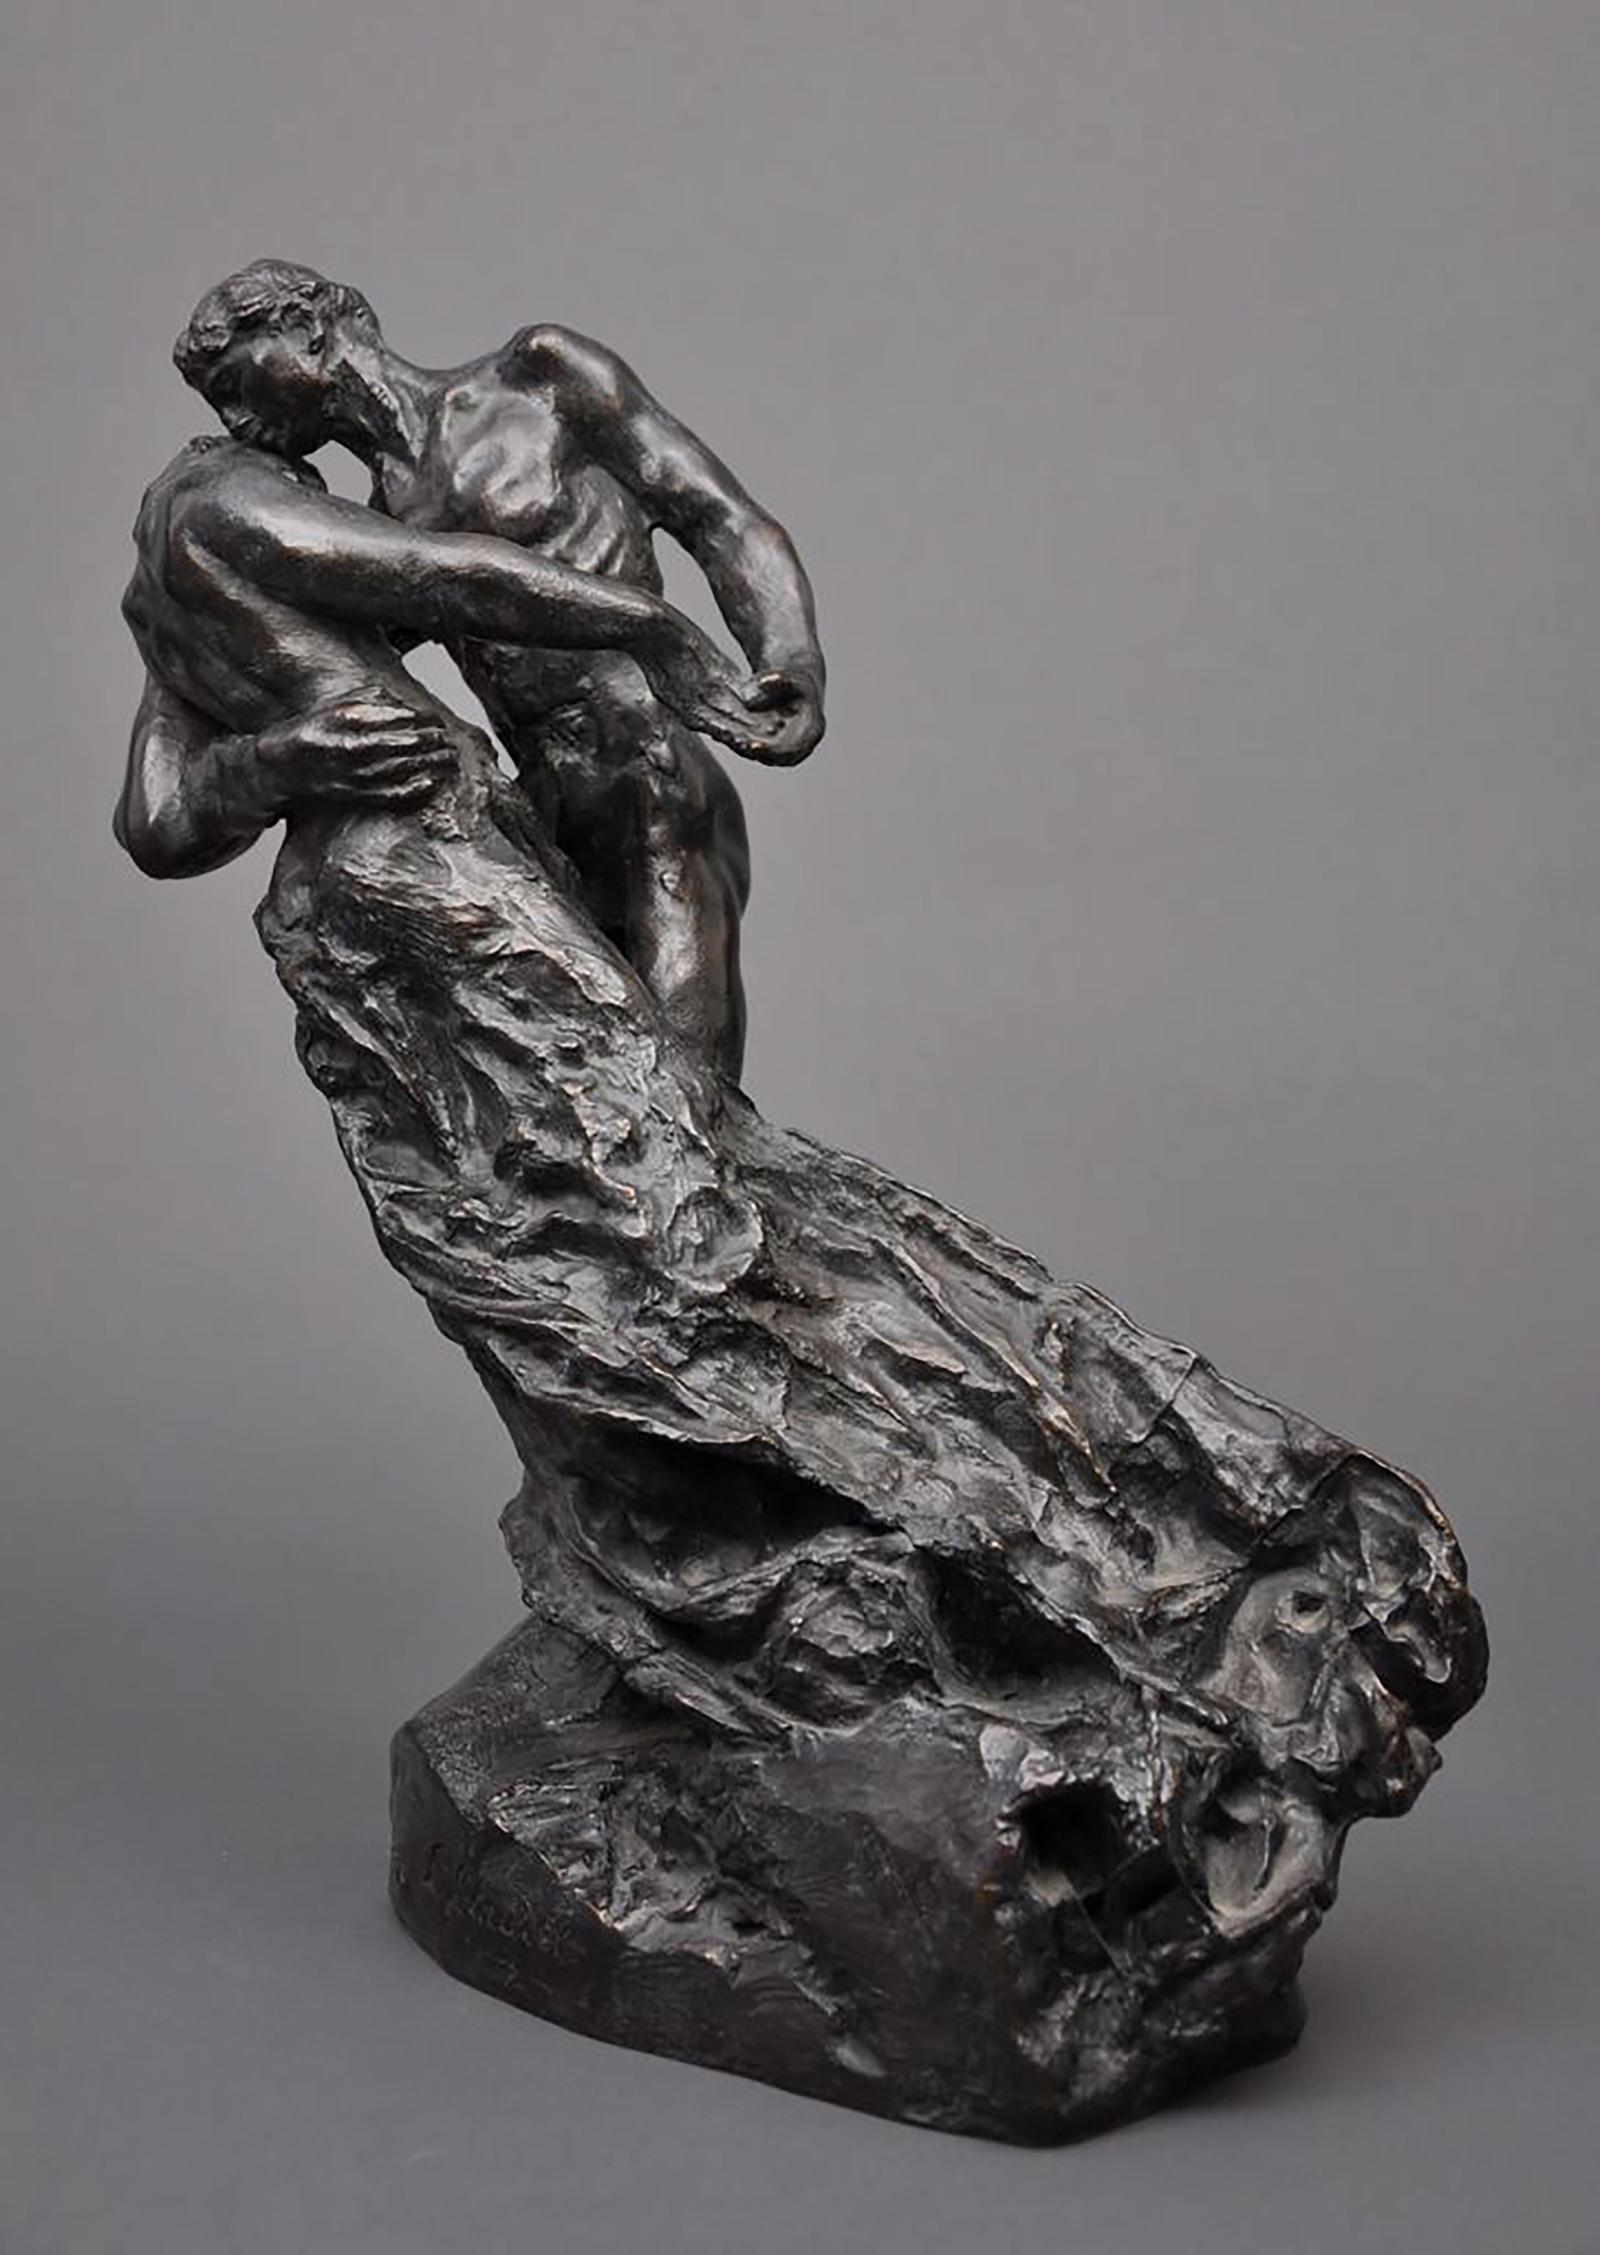 https://www.arts-in-the-city.com/wp-content/uploads/2018/08/camille-claudella-valse1erquart-du-20esieclebronze-fonte-posthume-e-blotnogent-sur-seine-musee-camille-claudelc-yves-bourel-1600x0.jpg